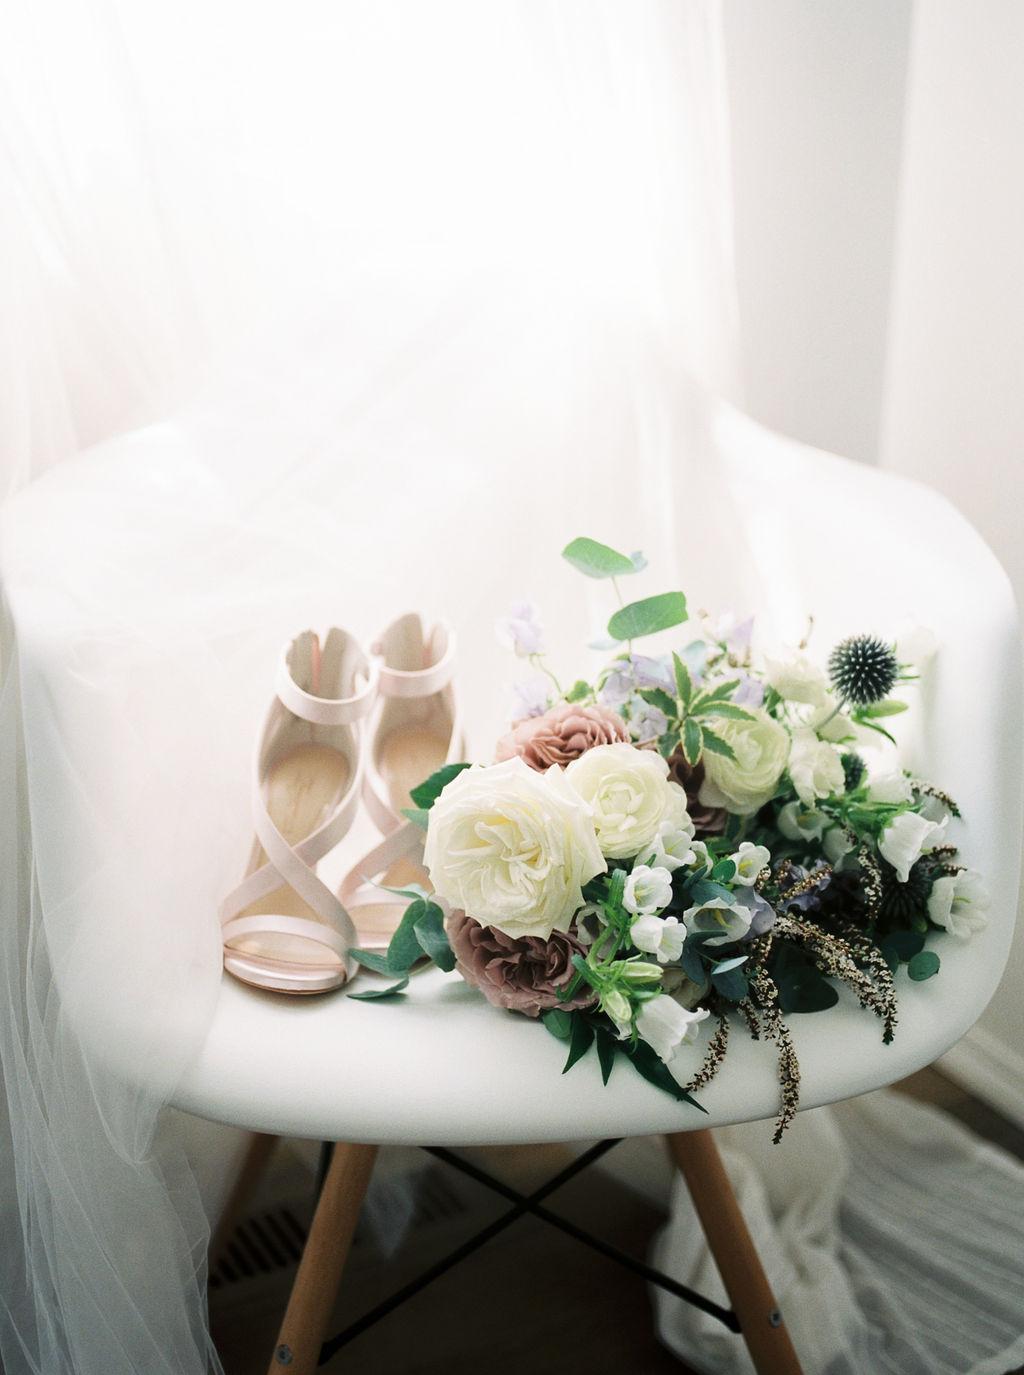 39_Wedding_Angie&Isaac_CochraneRancheHouse_MaricleKangPhoto_10319_04.jpg